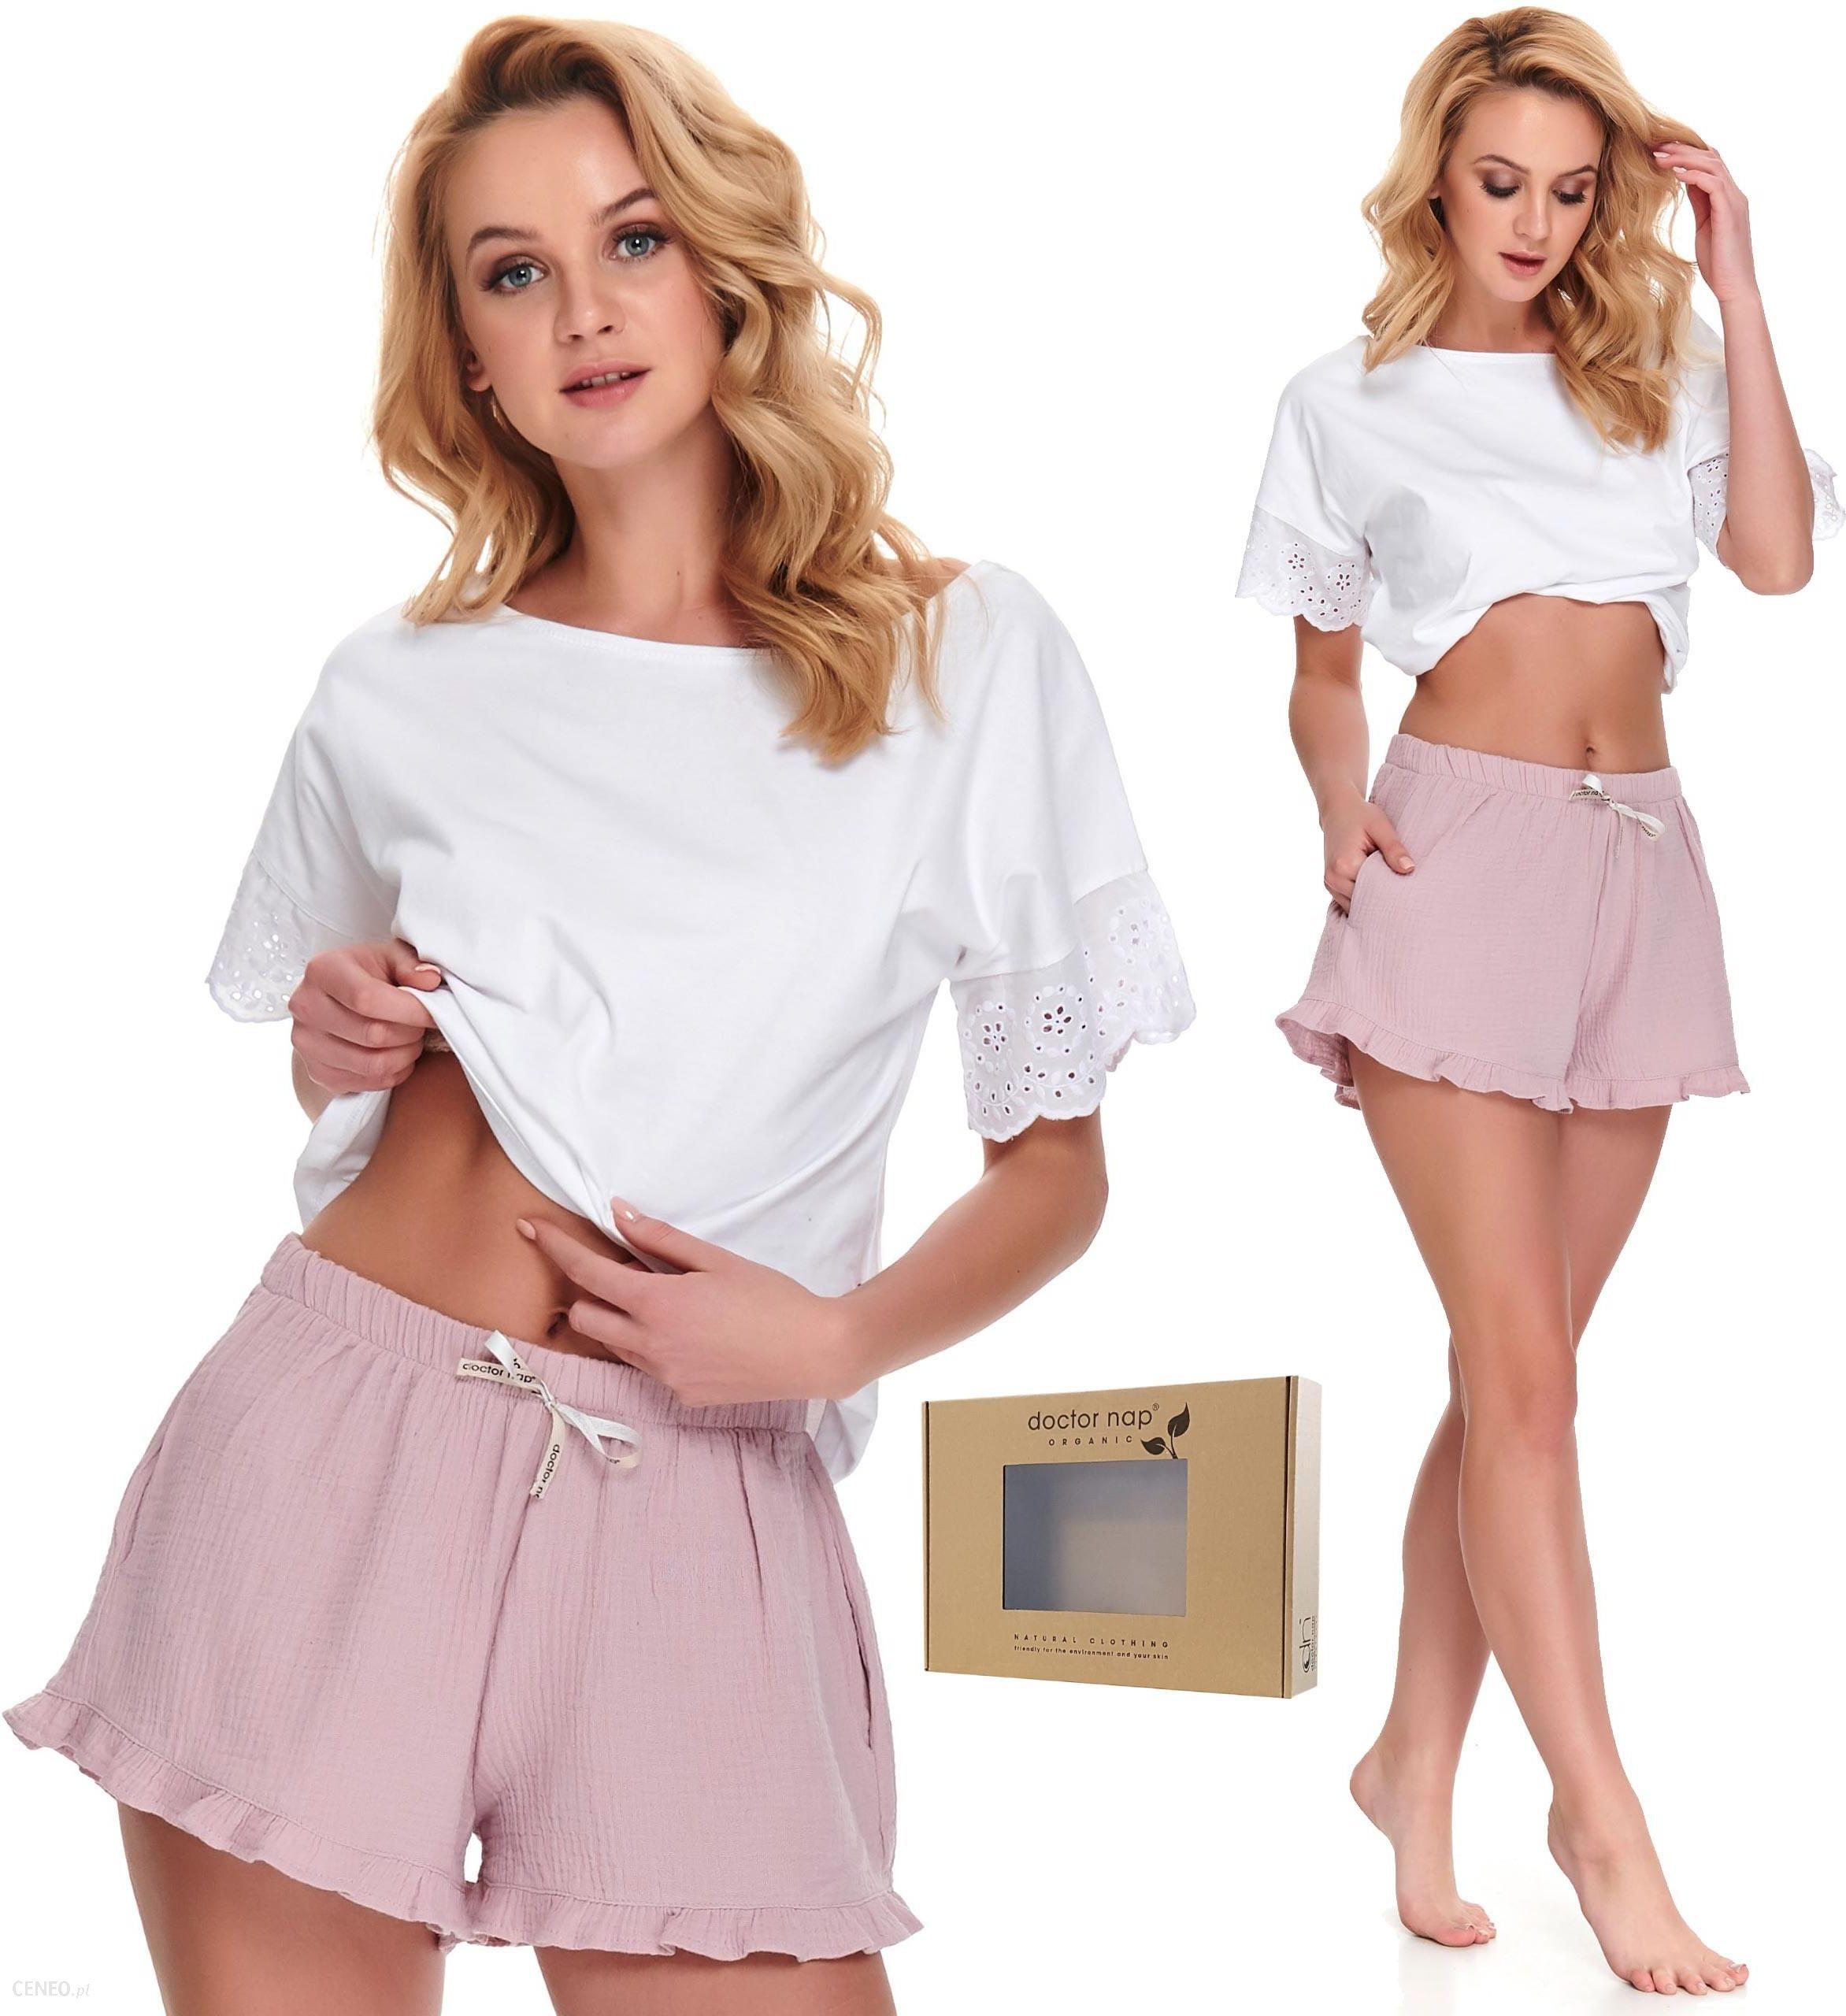 SHO.9905 Doctor Nap spodnie od piżamy damskie